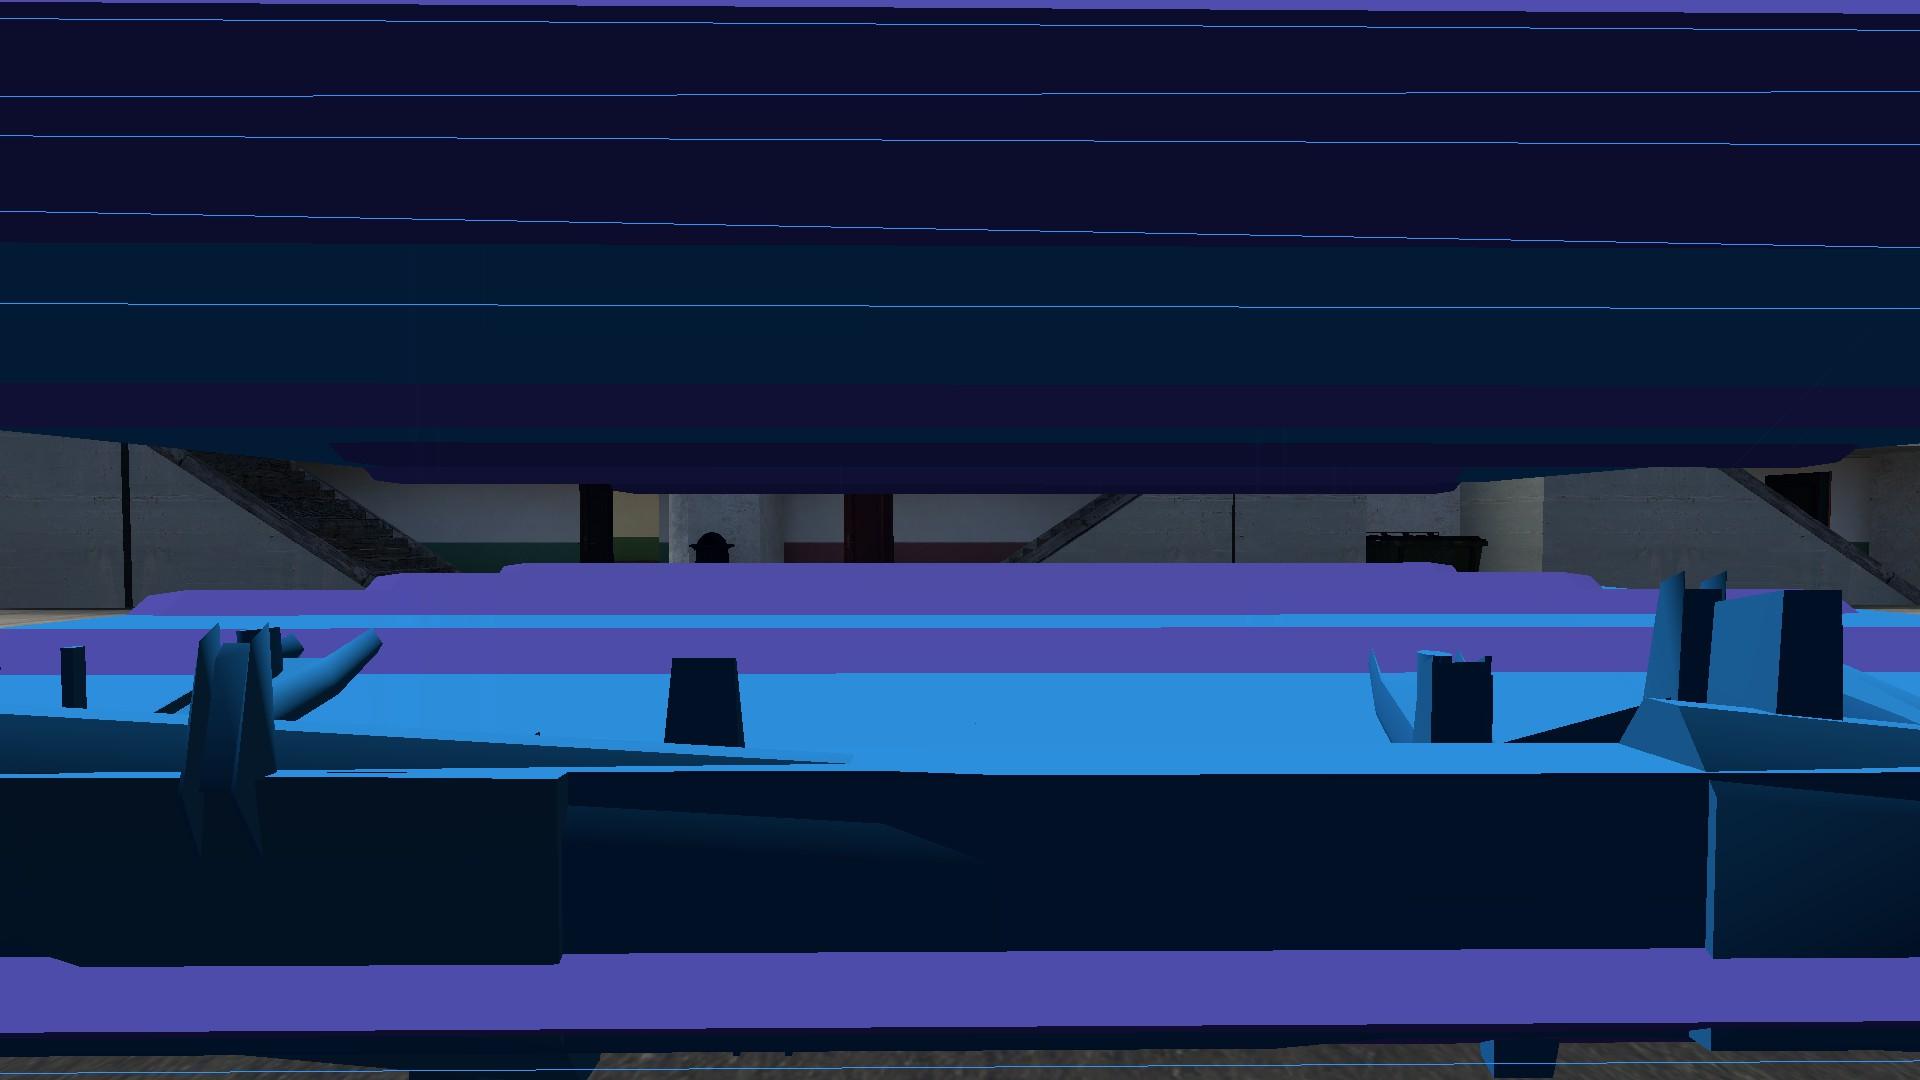 AC9AAA798407AF2986CF382BB5712930703C7CD4 (1920×1080)